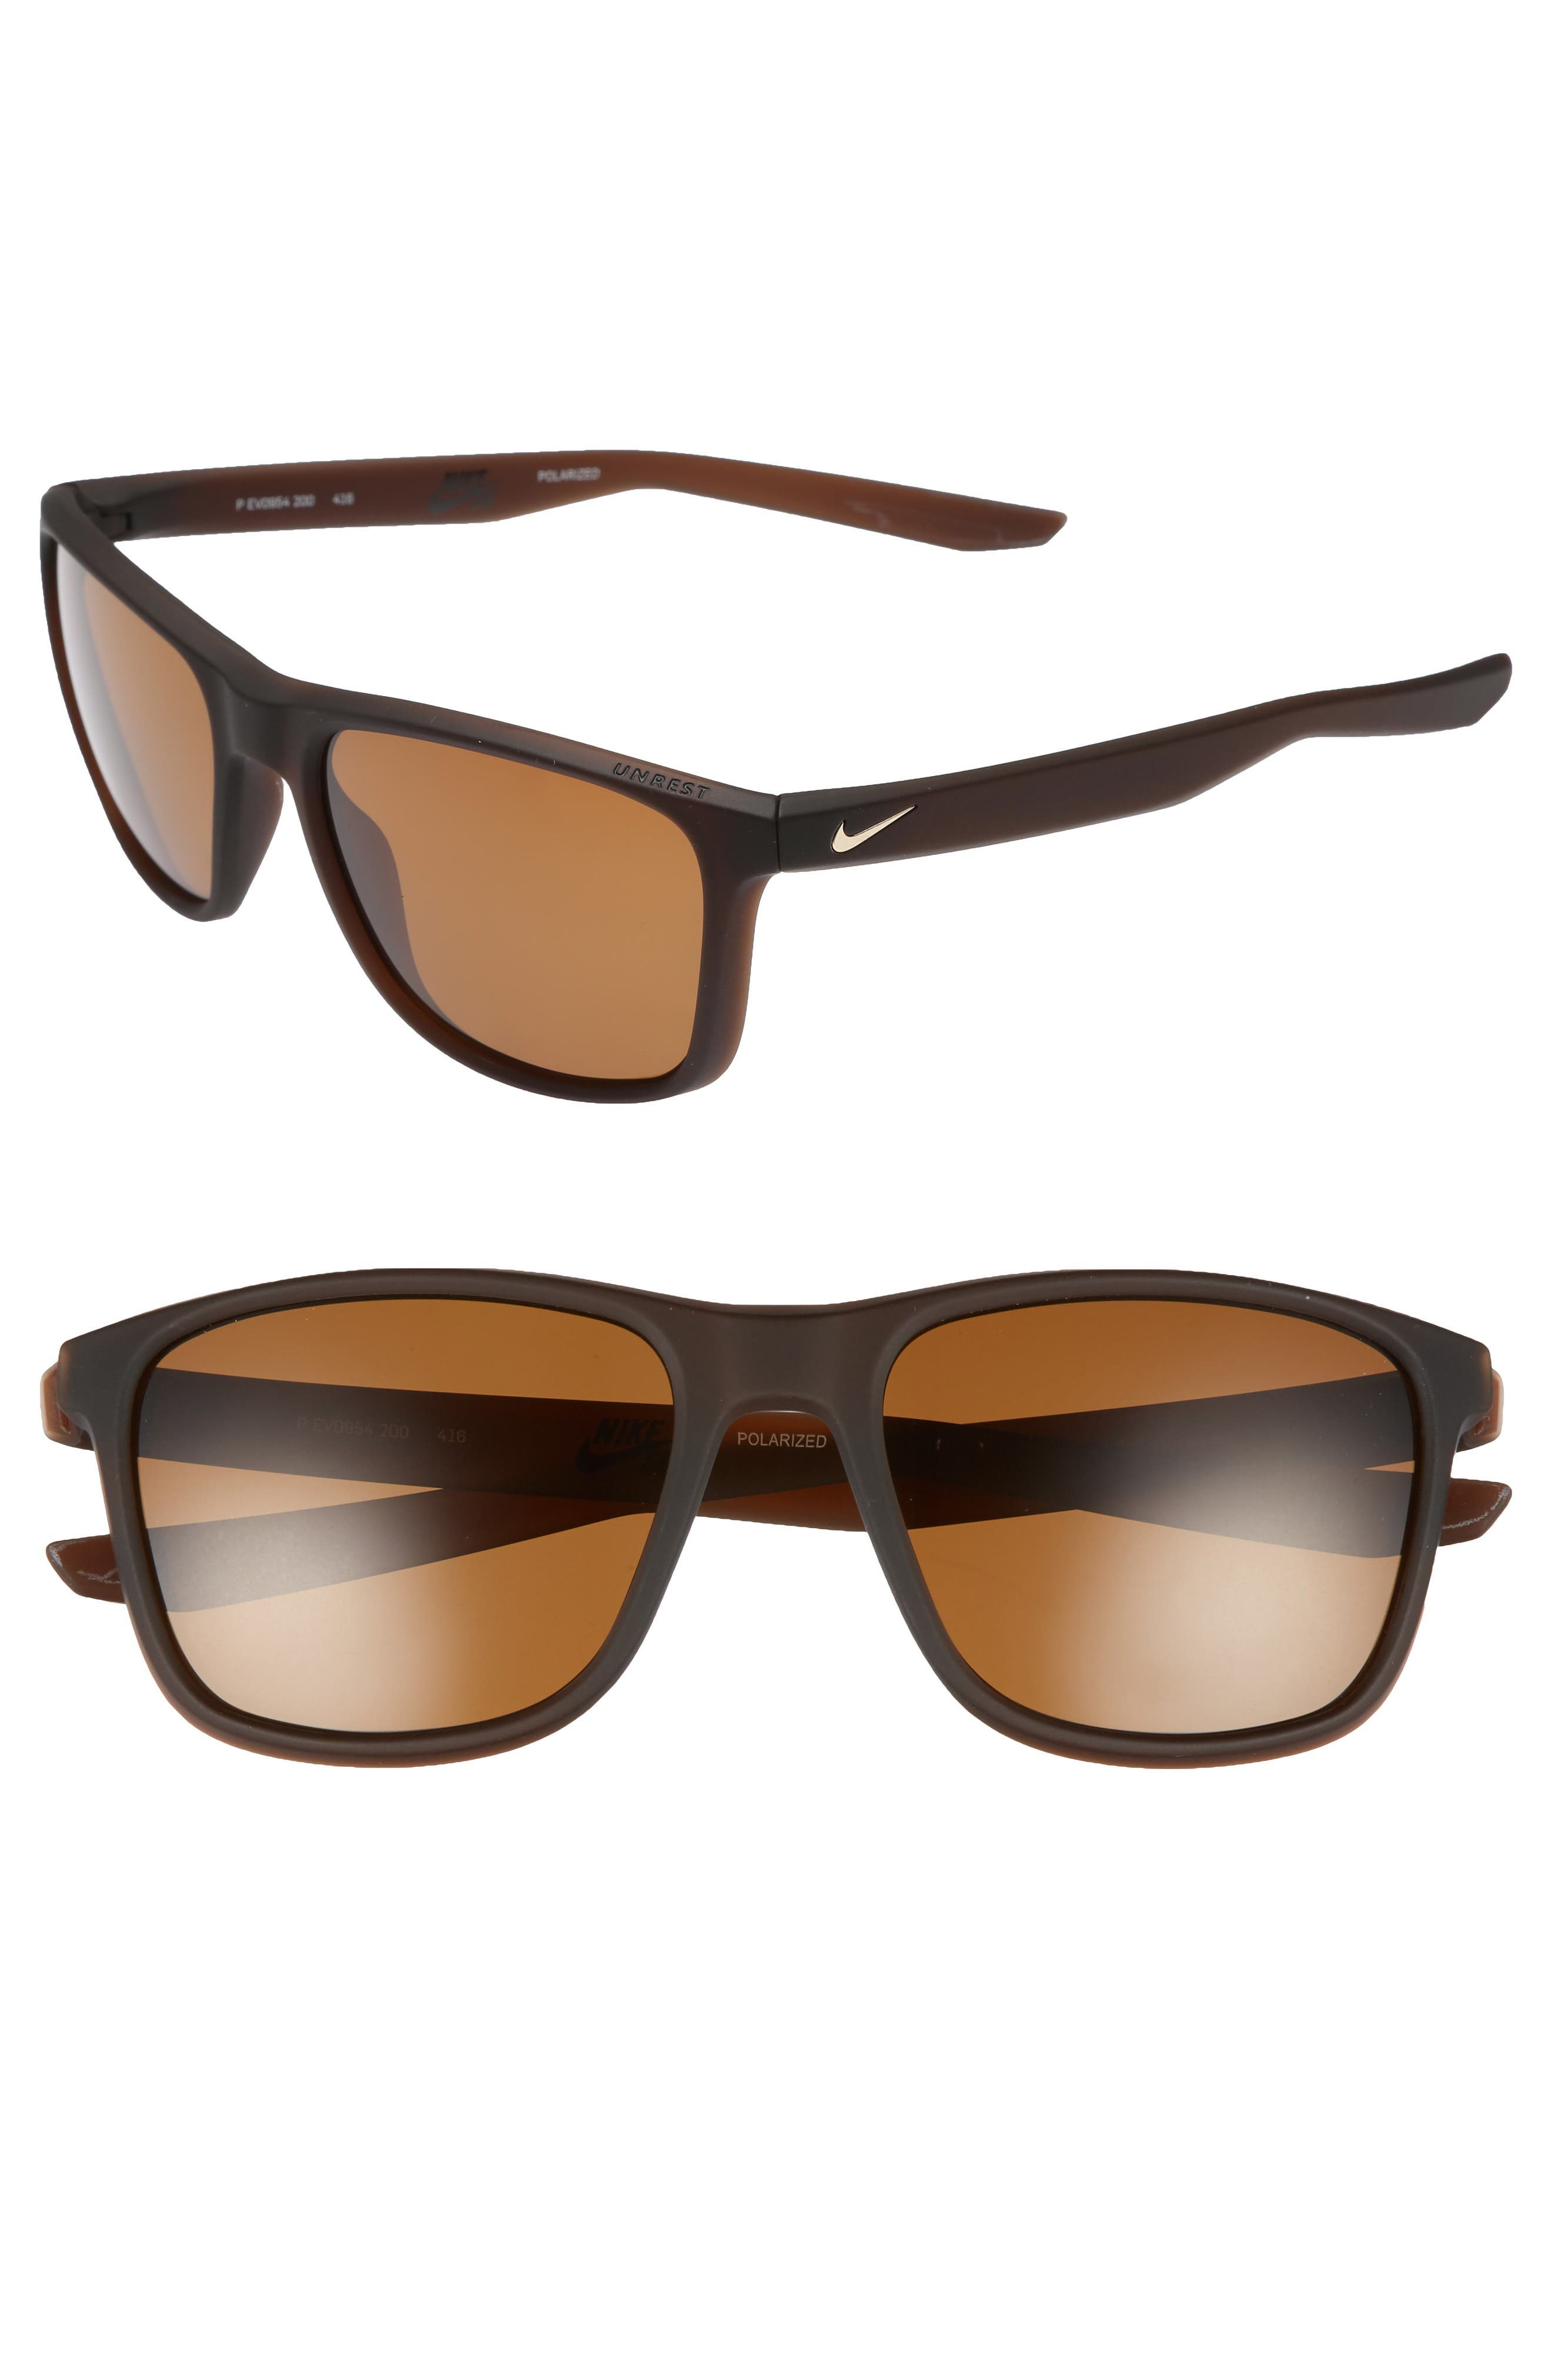 Nike Unrest 57mm Polarized Sunglasses